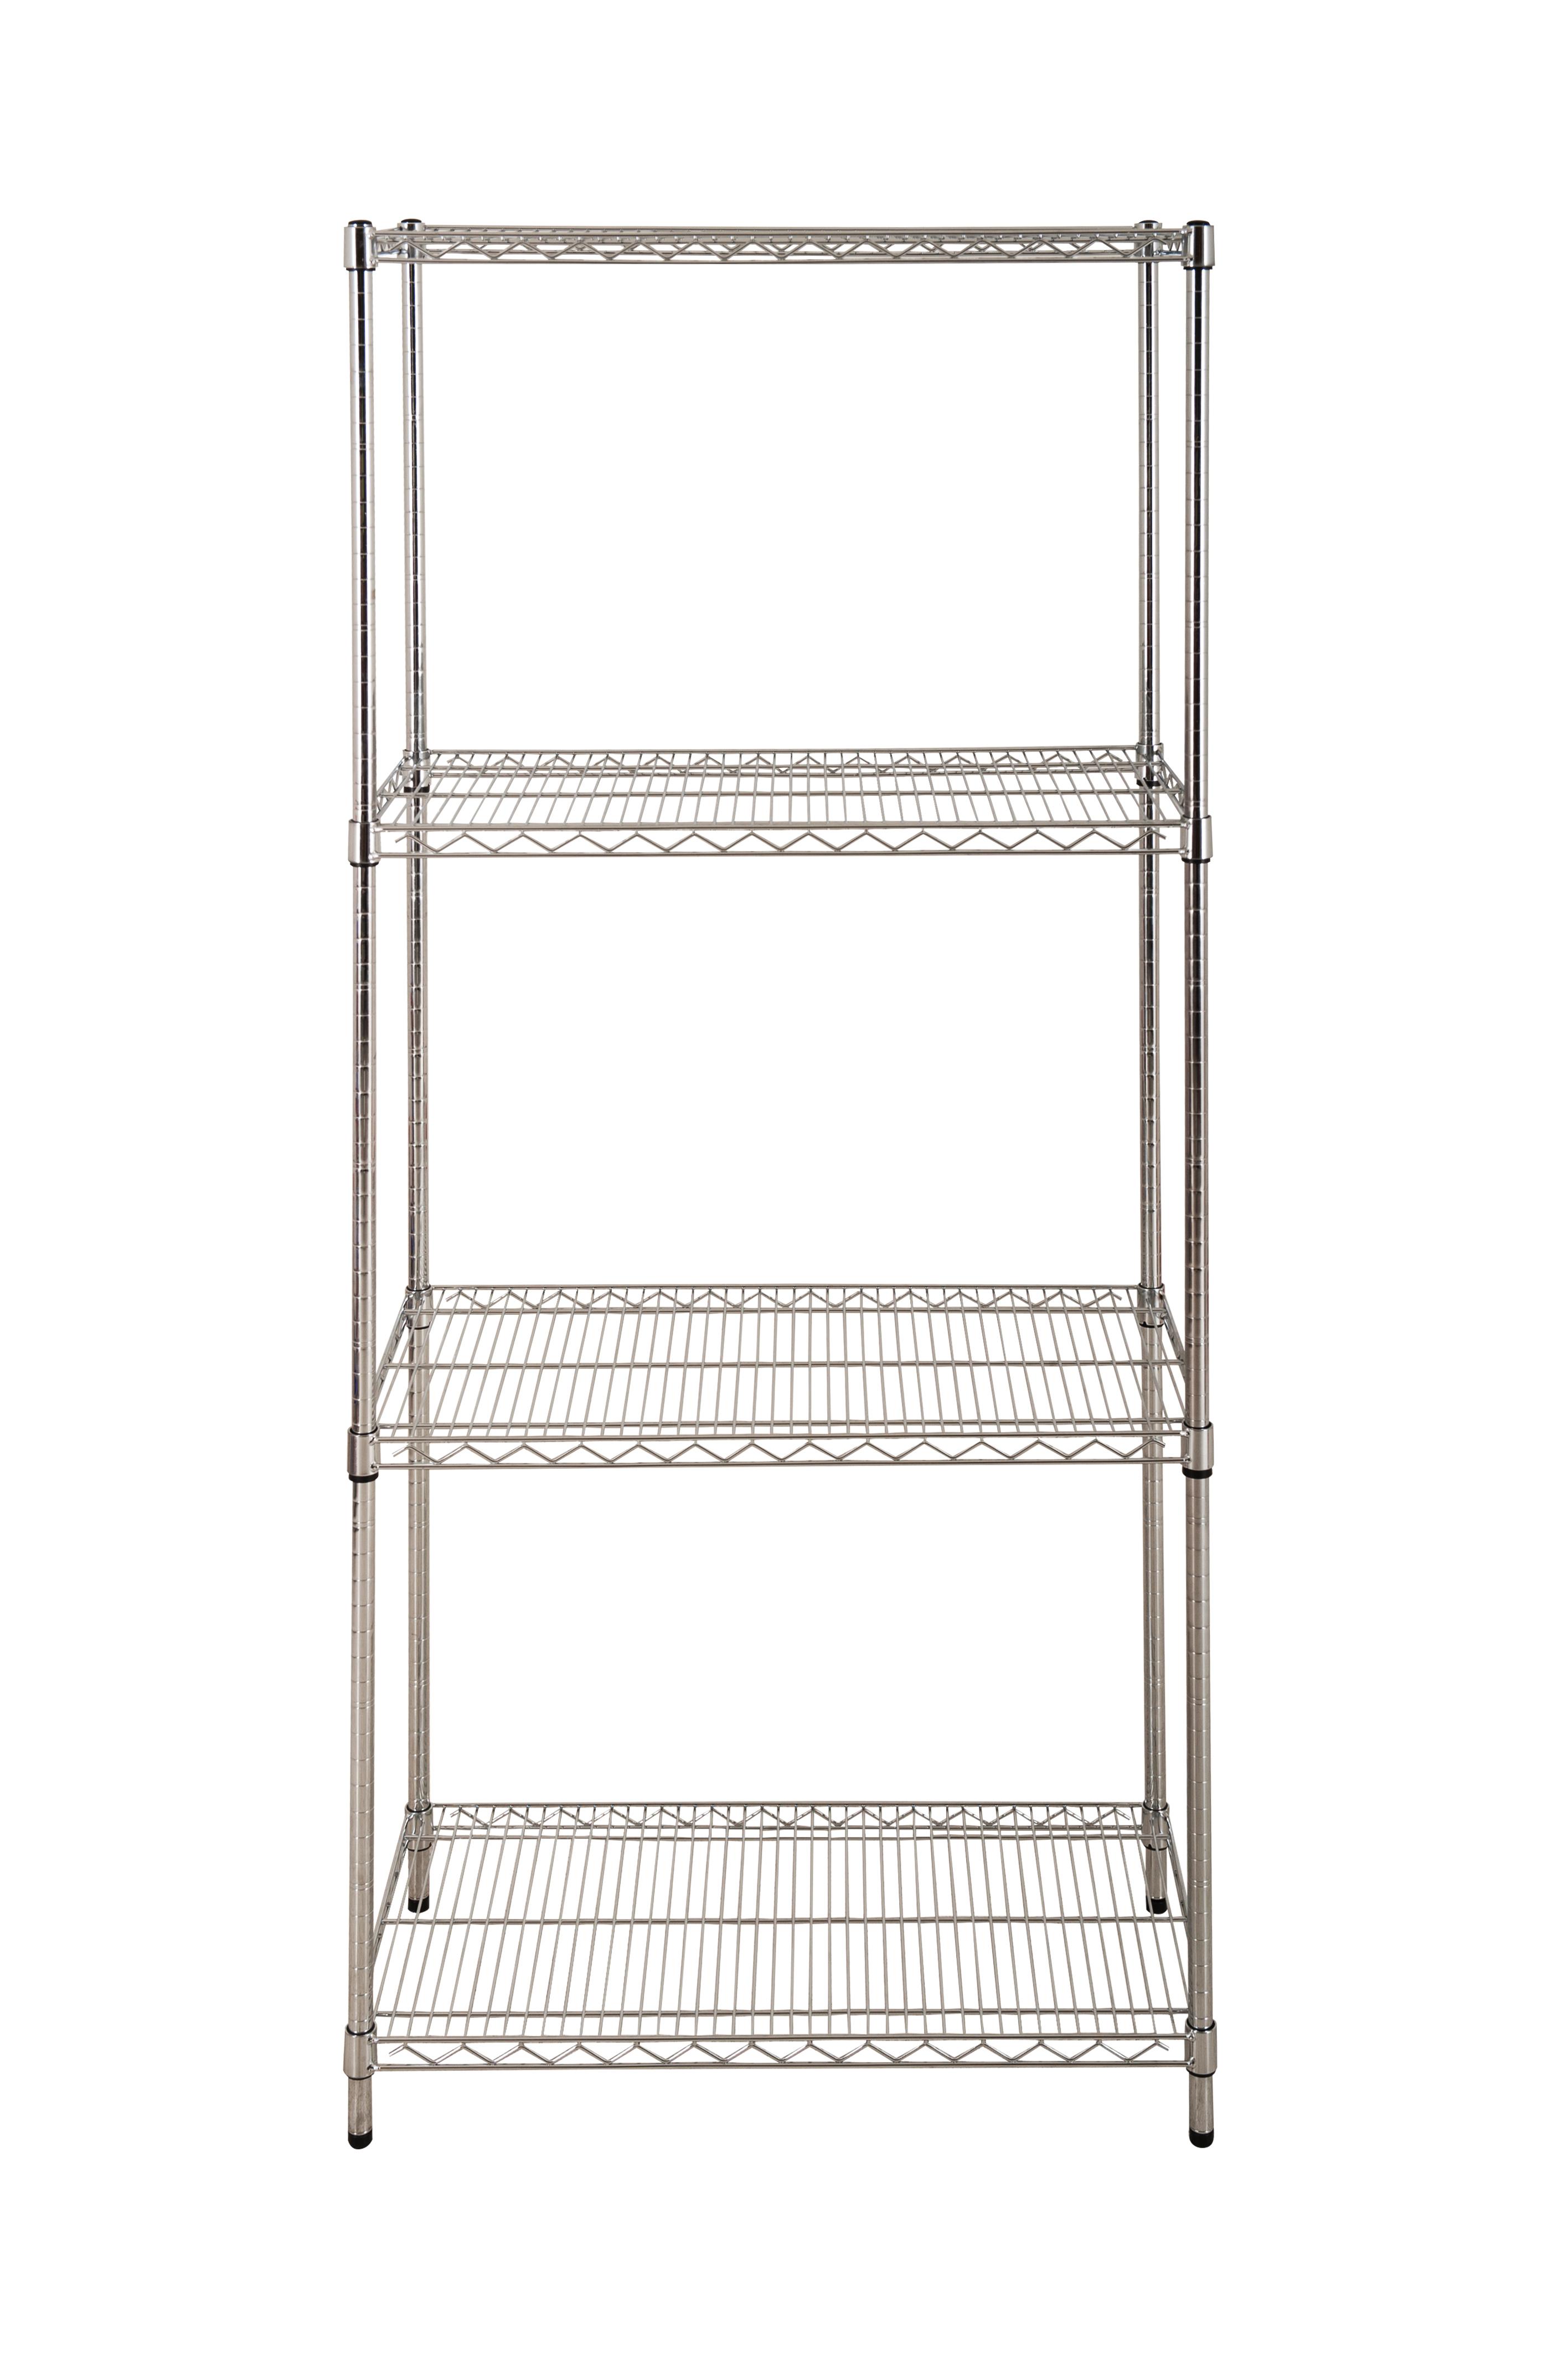 4 Shelf Chrome Starter Bay - 1600 x 1220 x 610